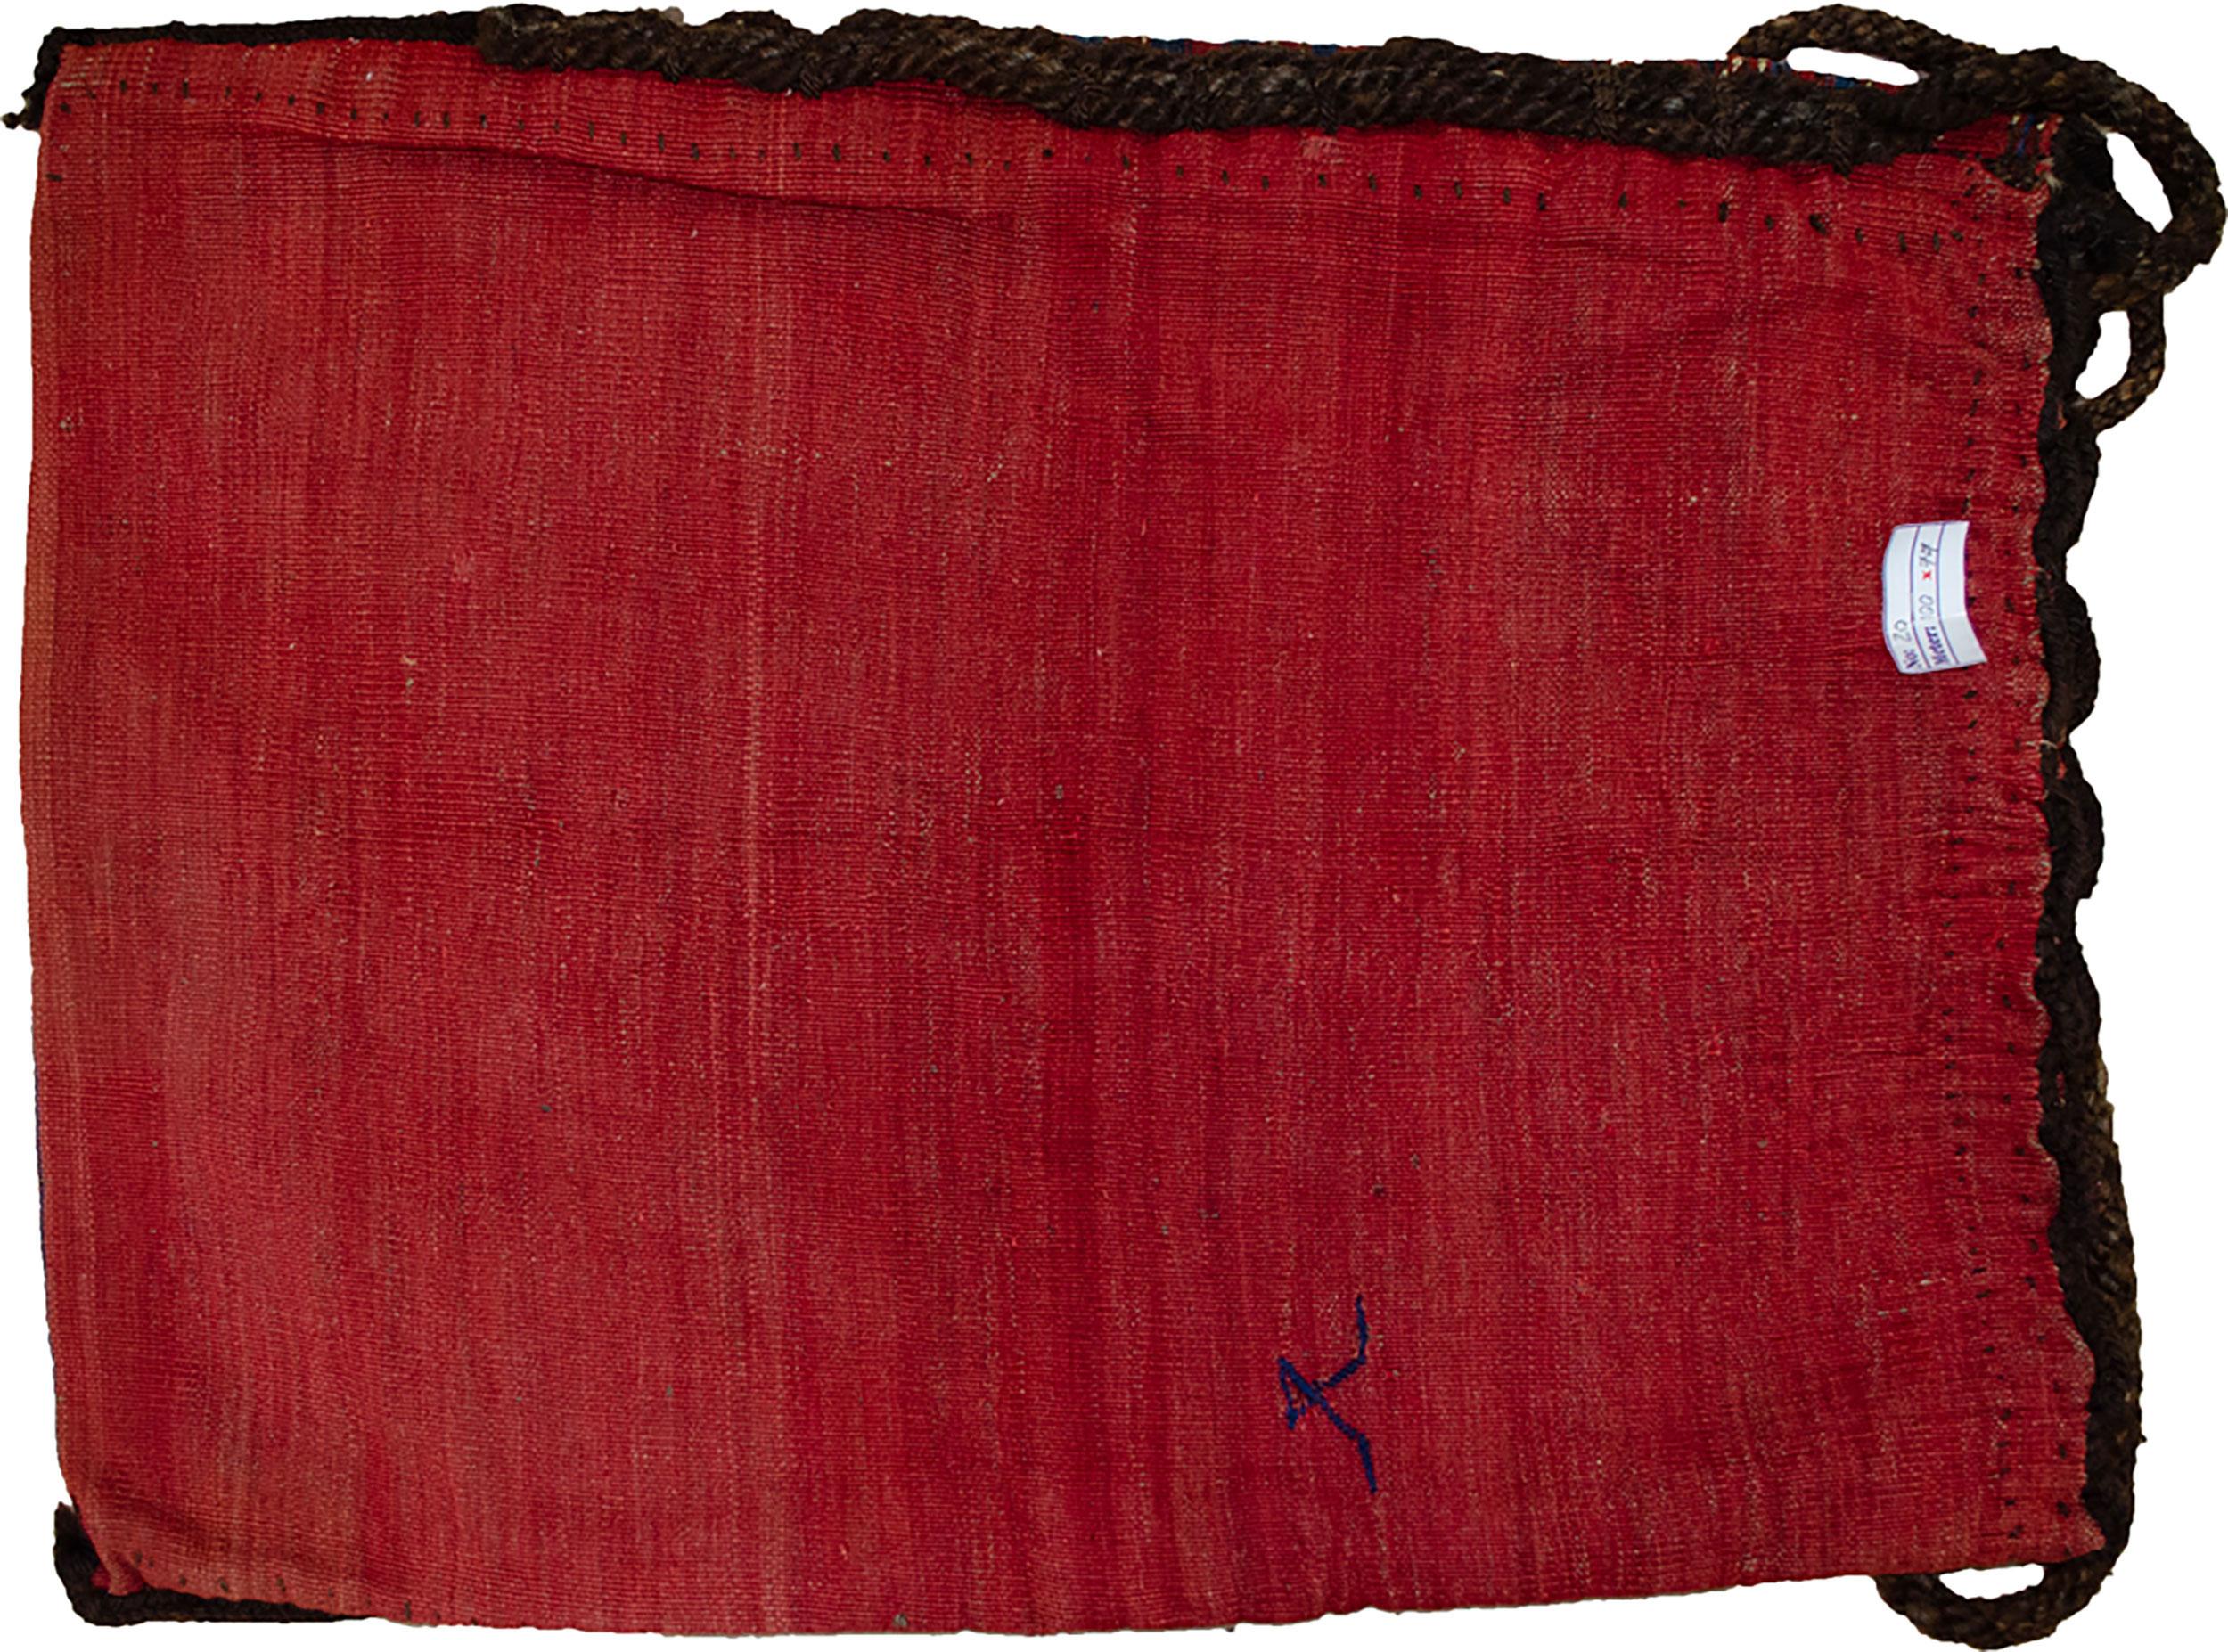 Vintage Turkman Tobreh Bag 100x77cm